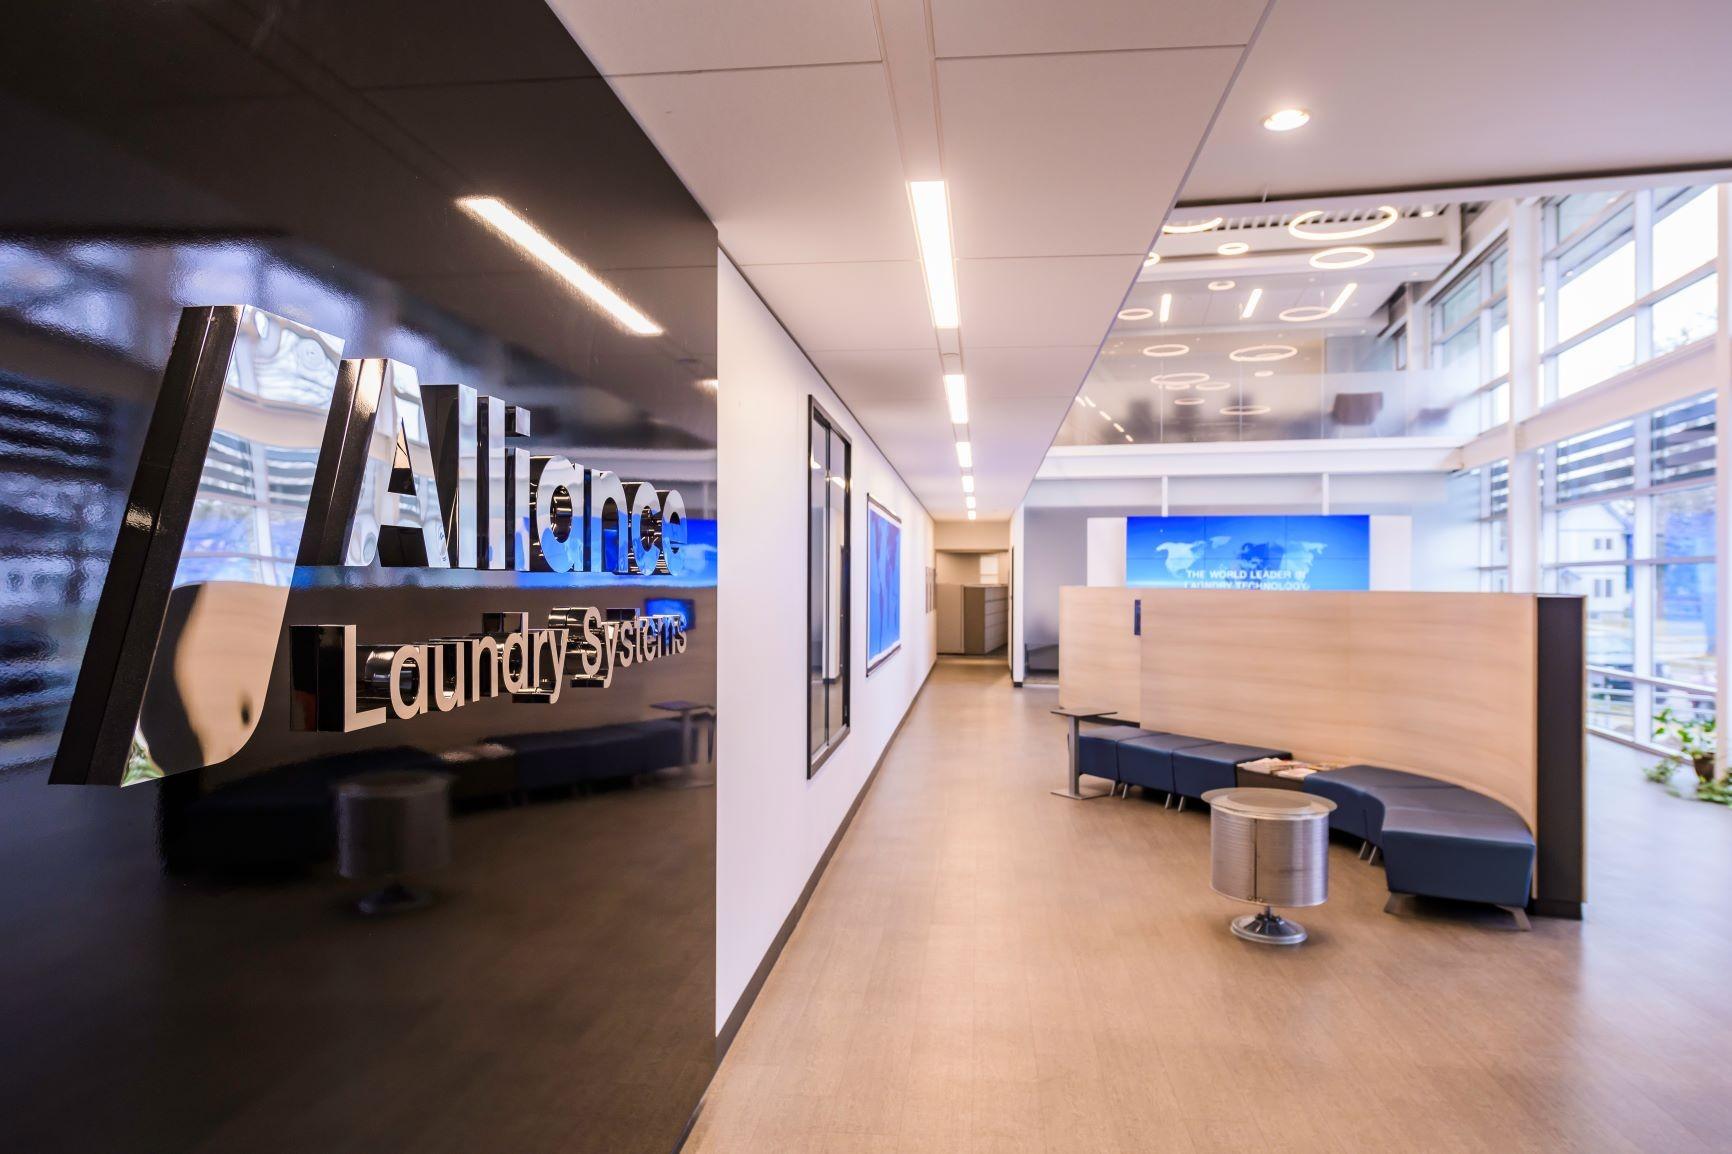 Alliance Laundry Systems LLC | LinkedIn